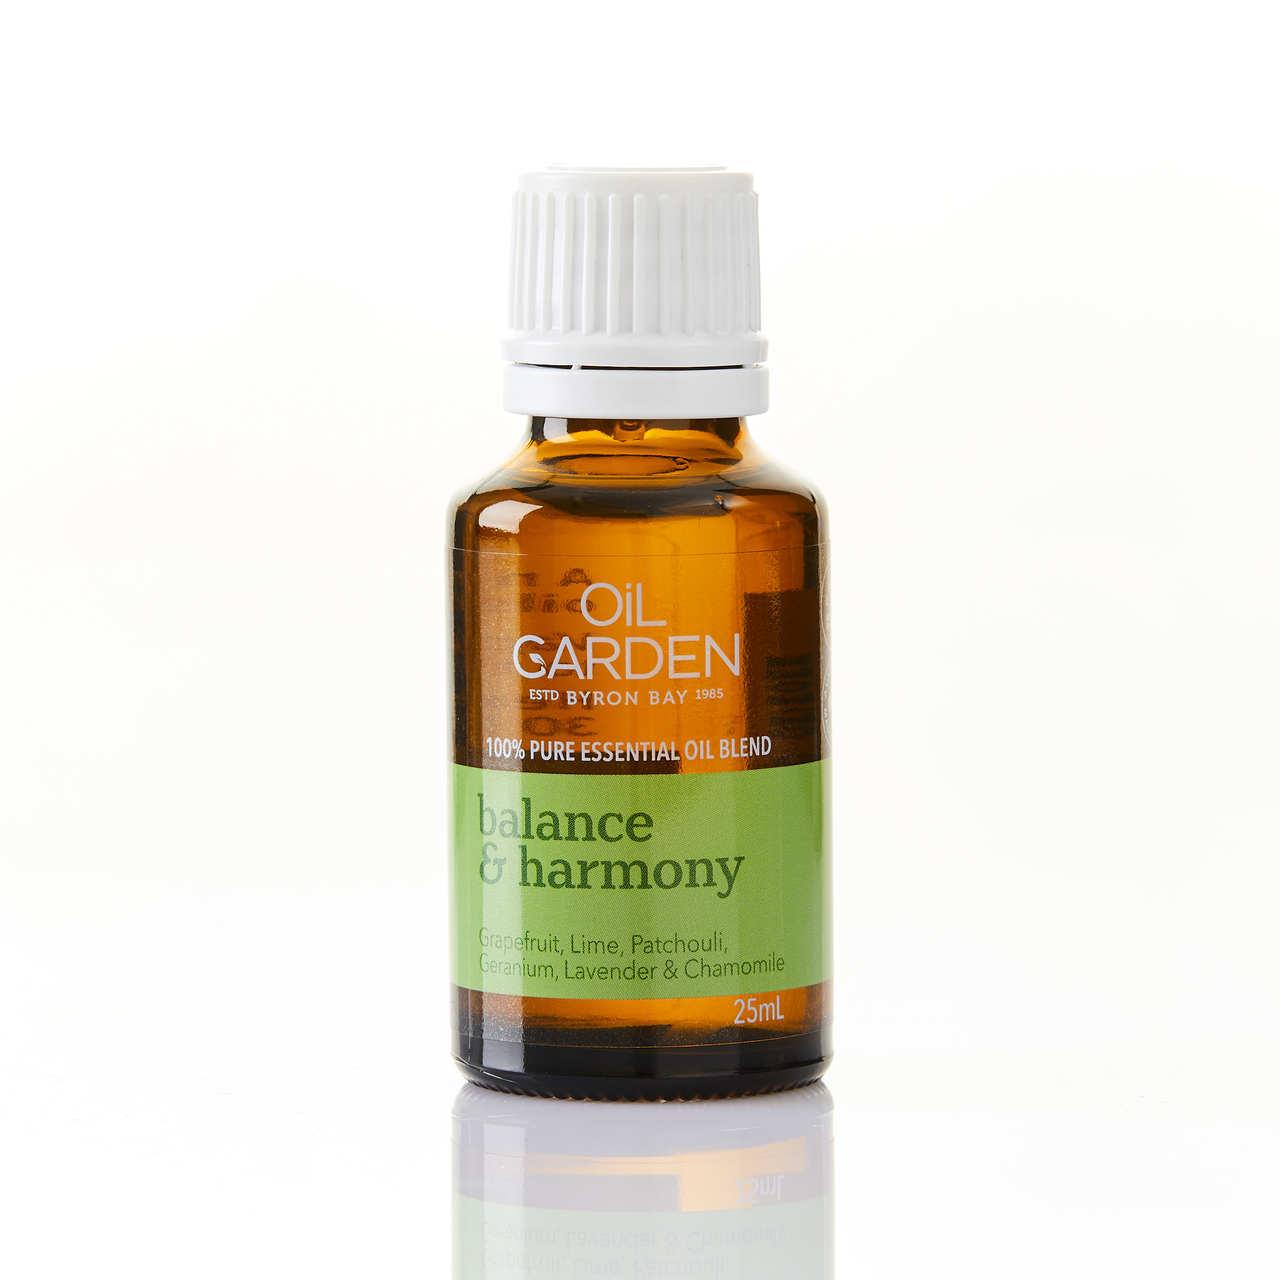 Oil Garden Balance & Harmony Essential Oil Blend 25mL 6620008